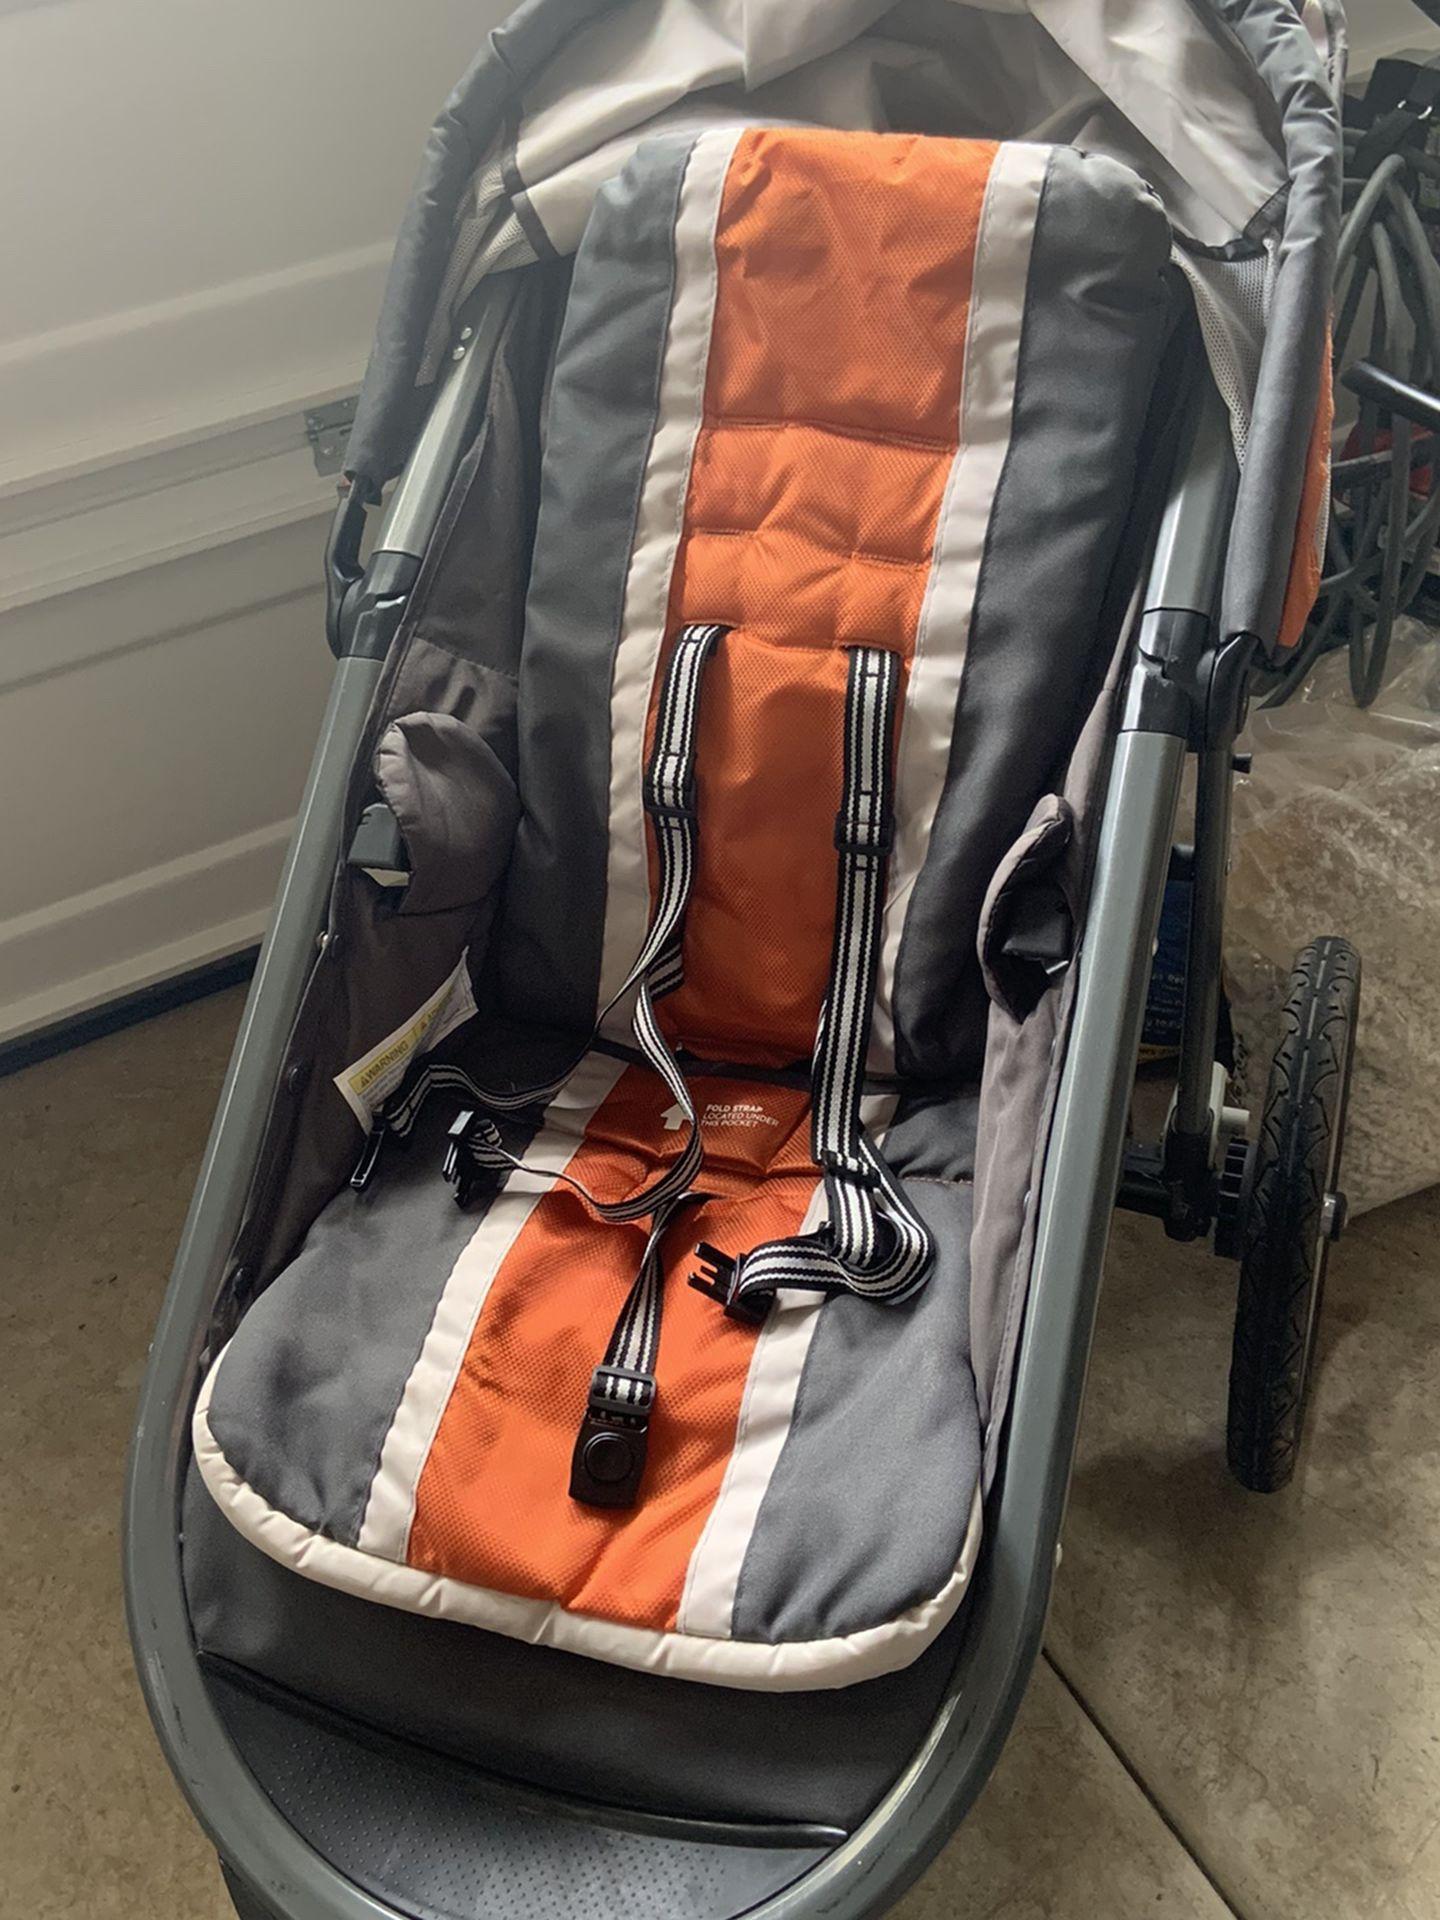 Jogging 3 Wheel Stroller